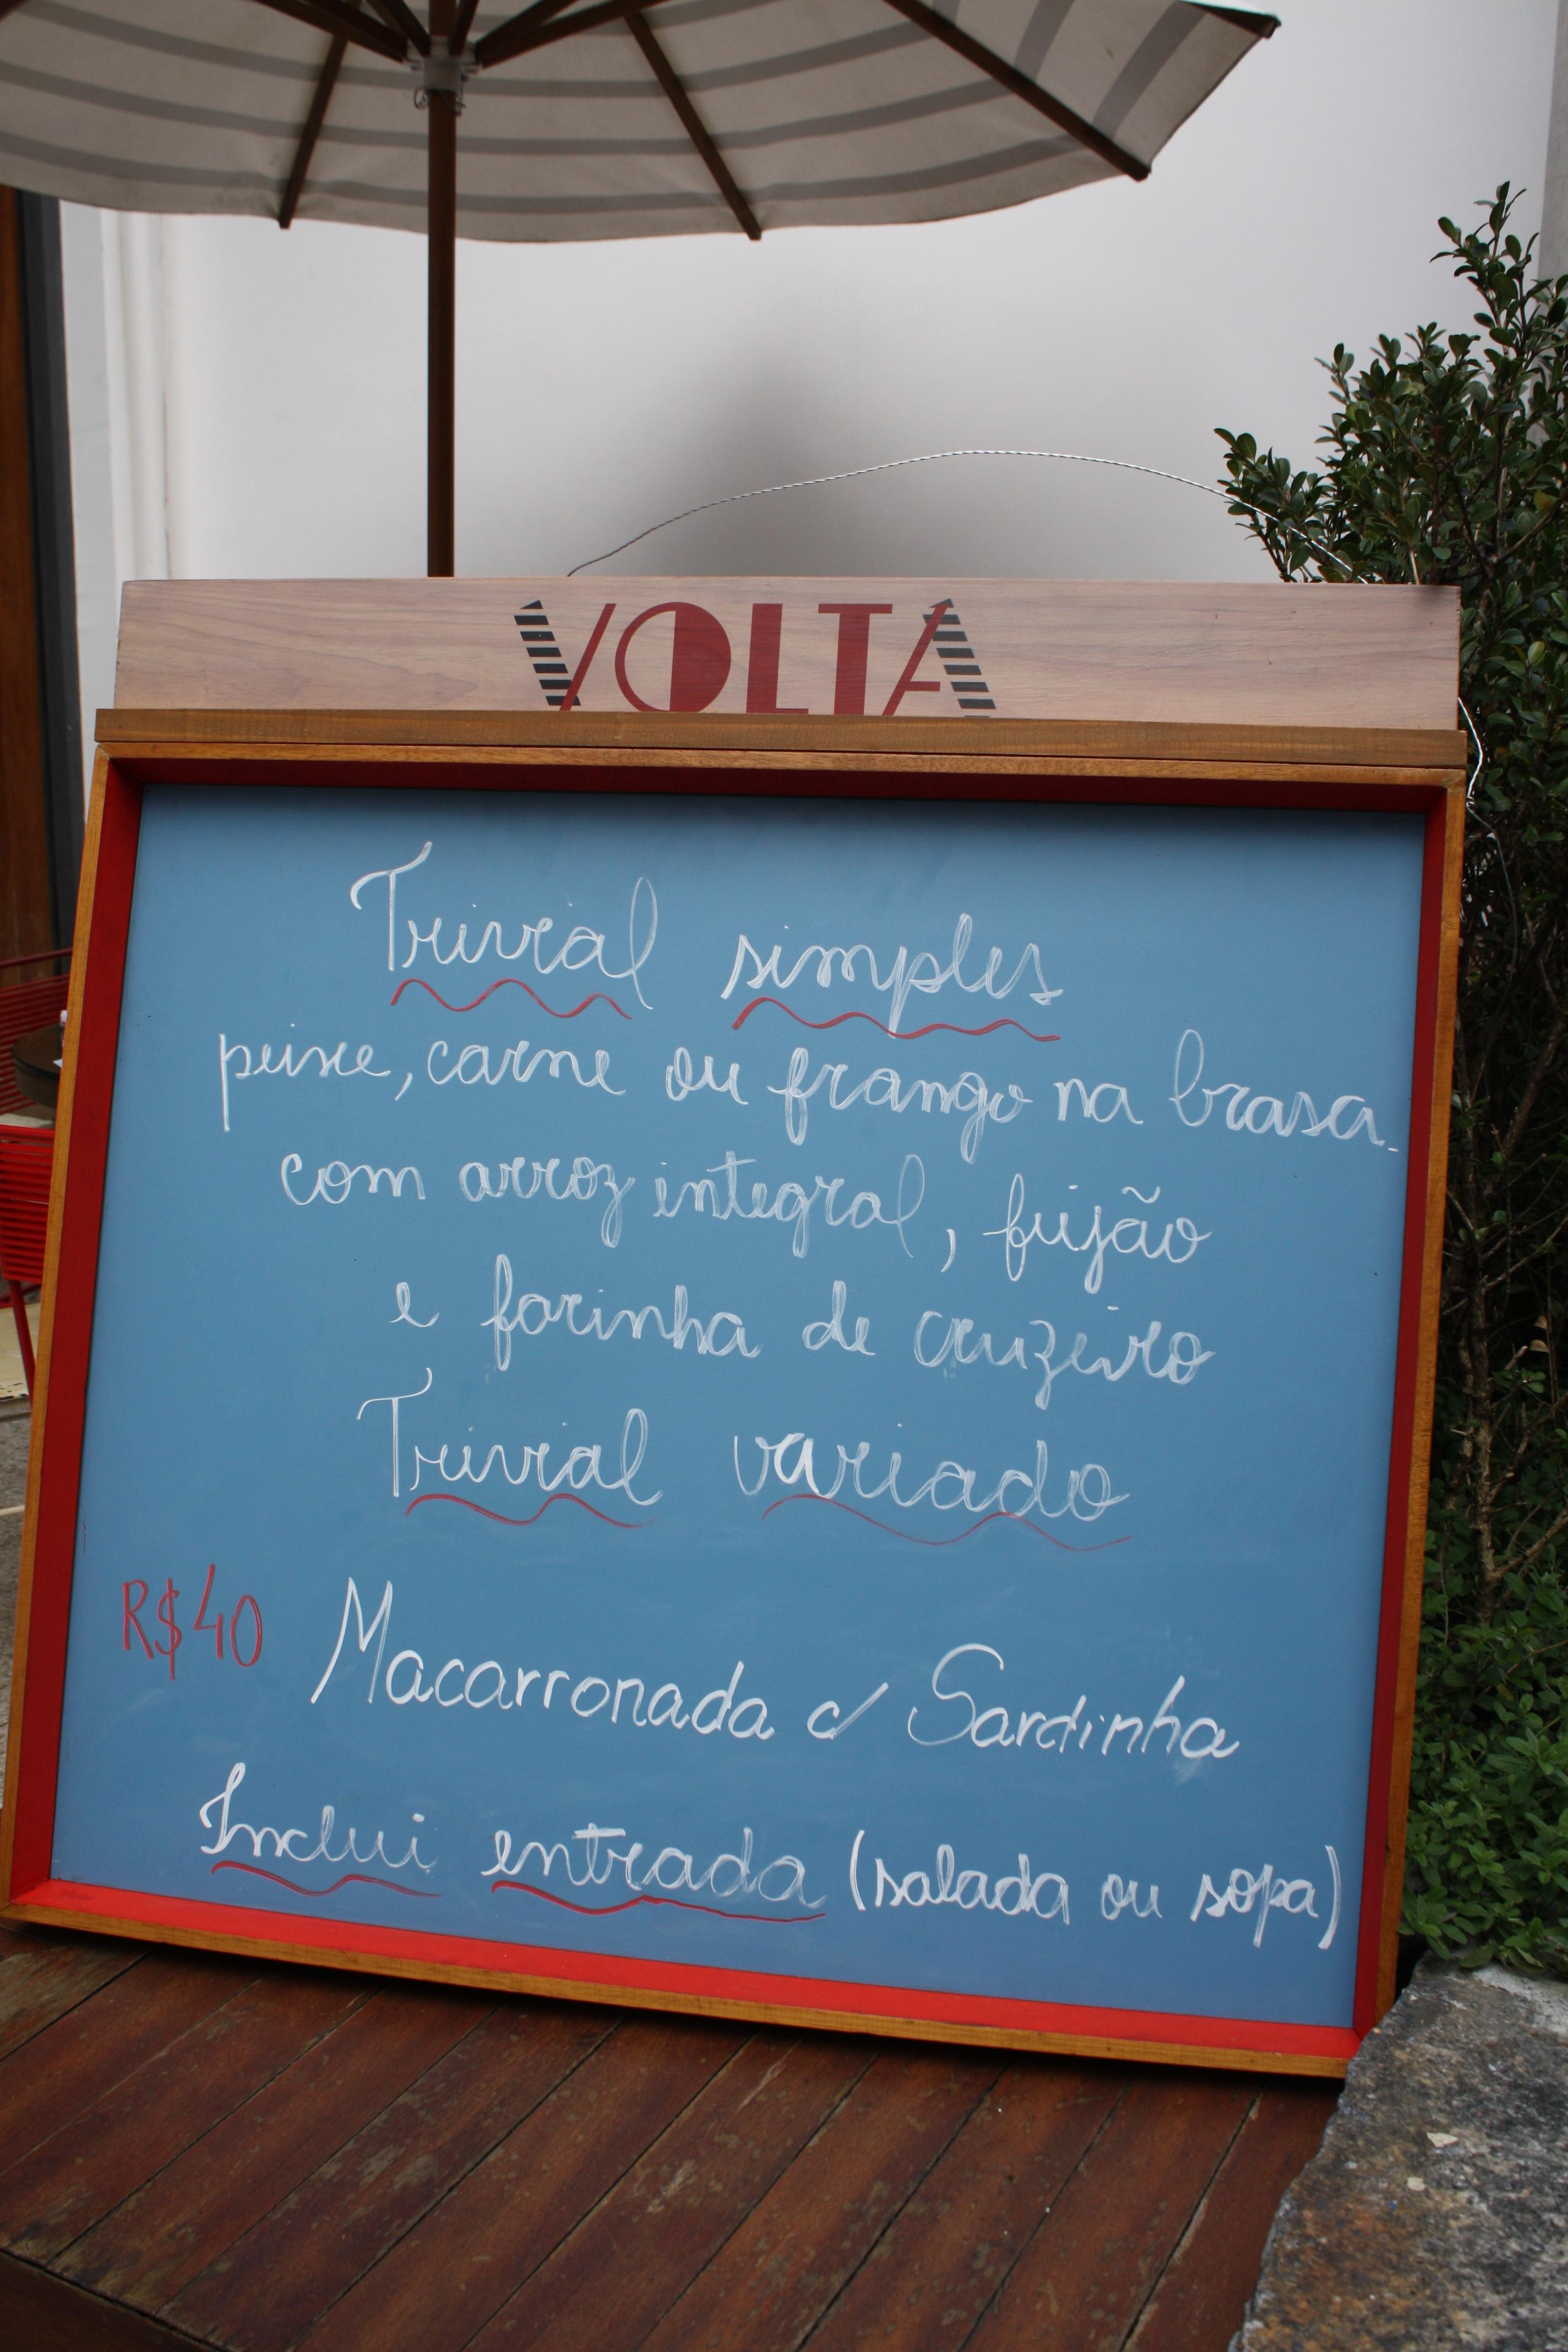 The Brazilian Foodie